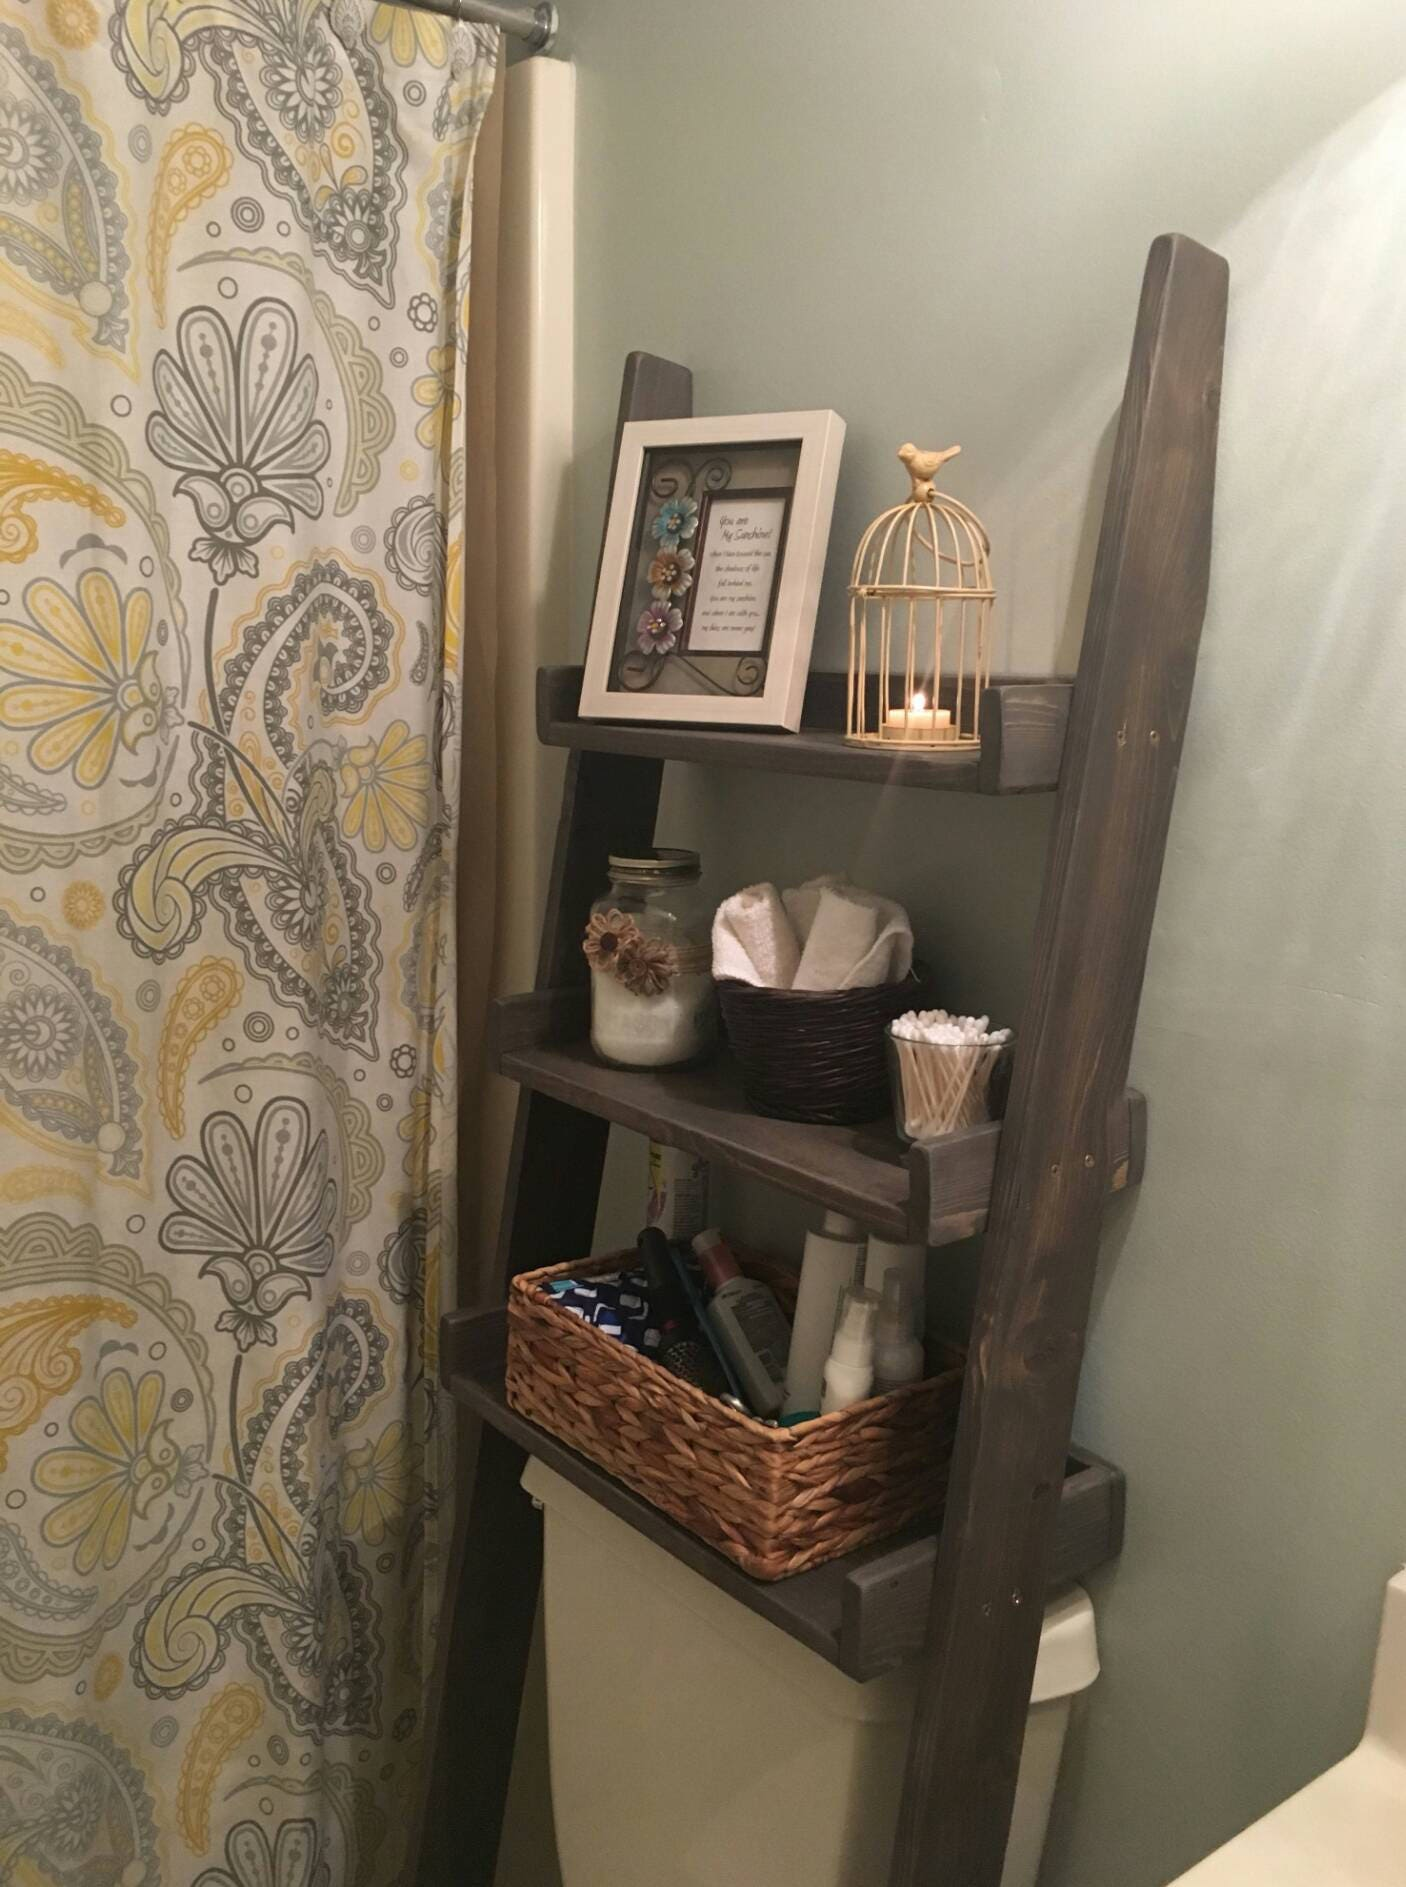 Over the Toilet Ladder Shelf Toilet Topper Bathroom Storage